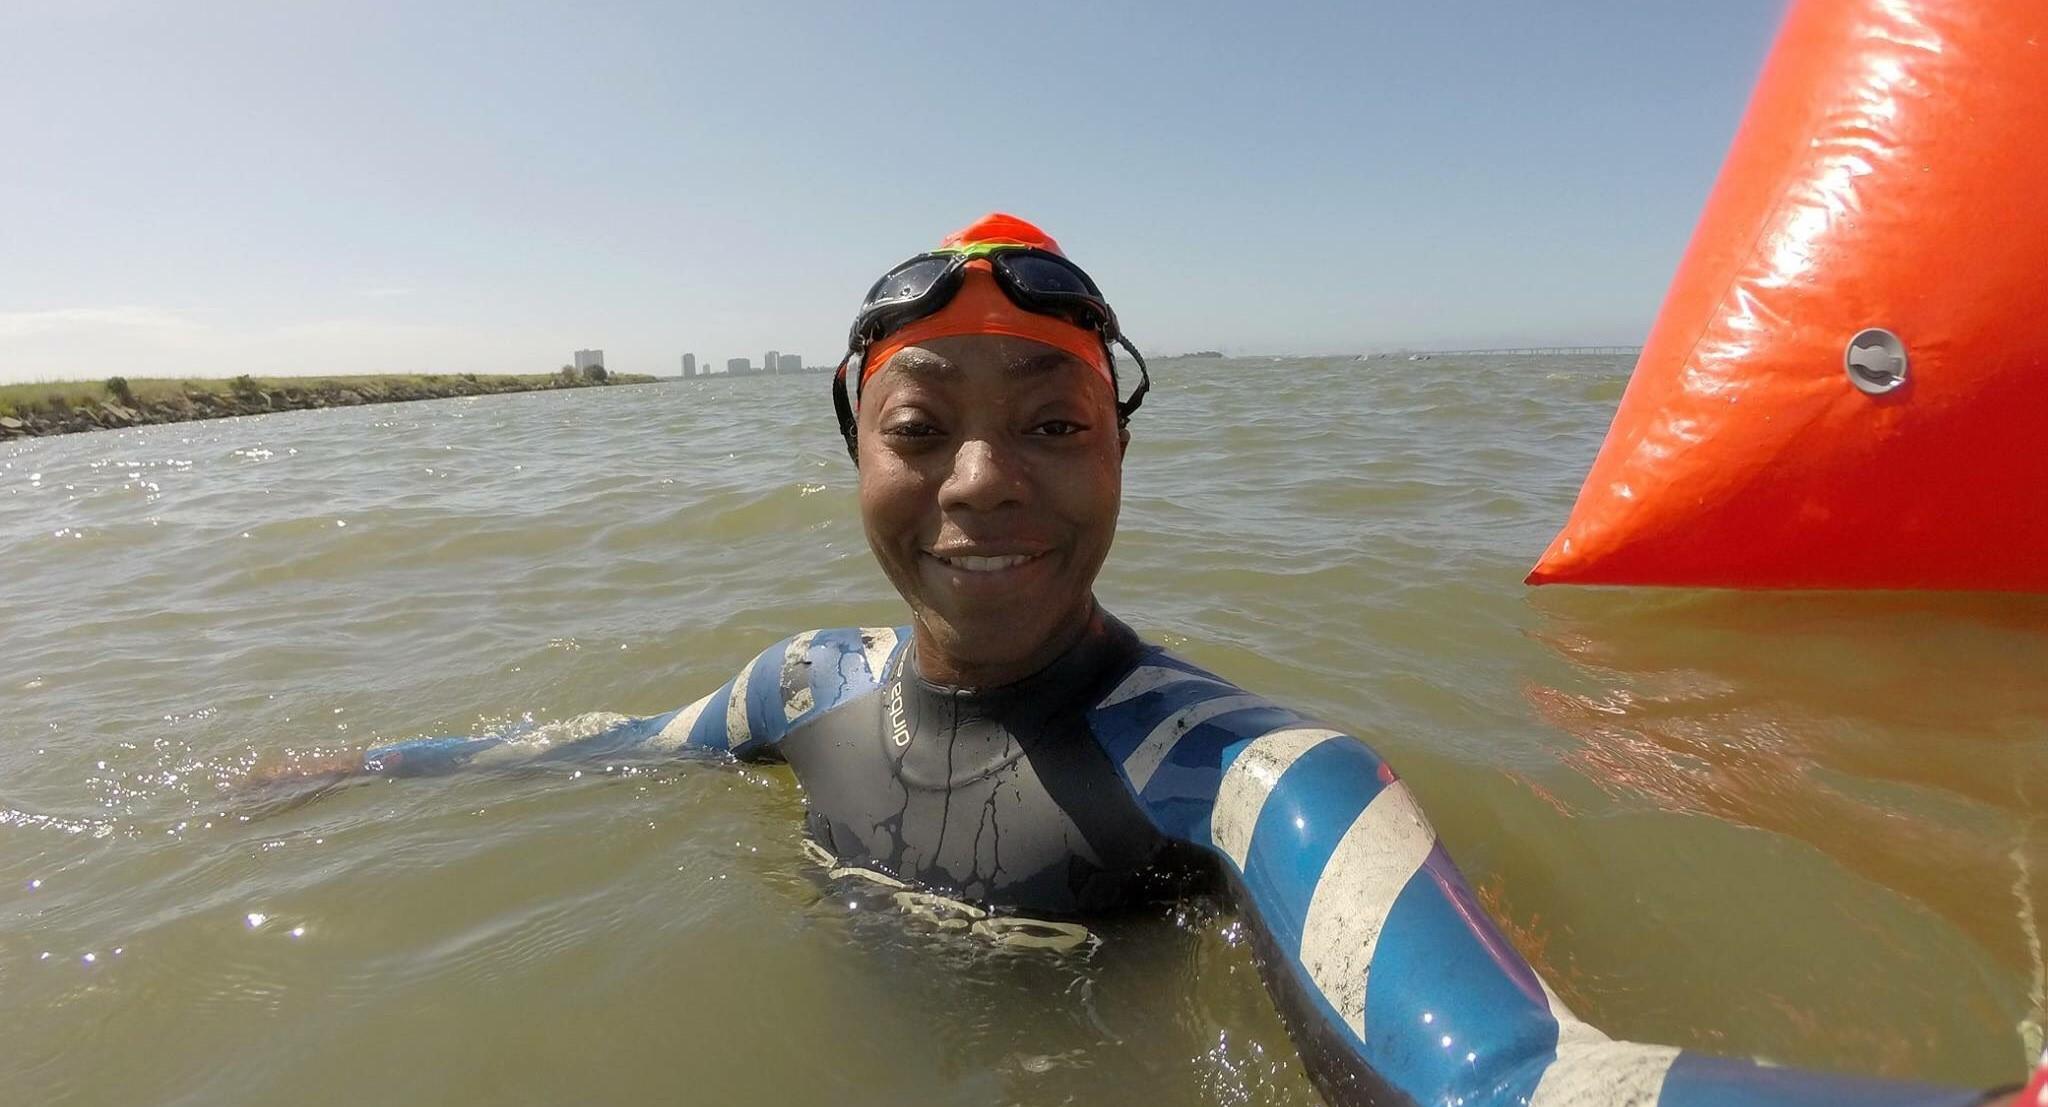 Angela Stockard Odyssey Open Water Swimming